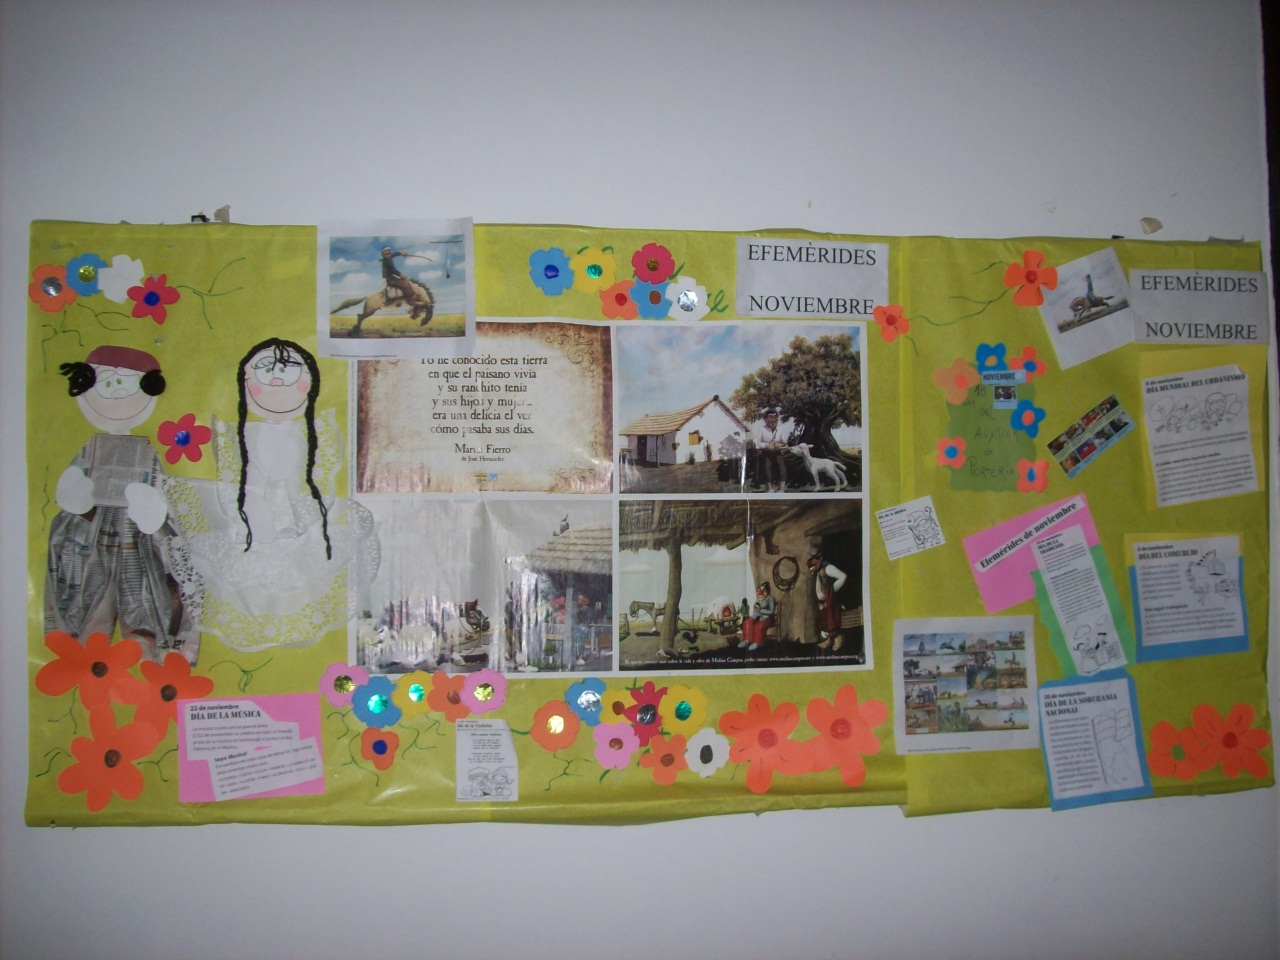 carteleras escolares - photos of teenagers